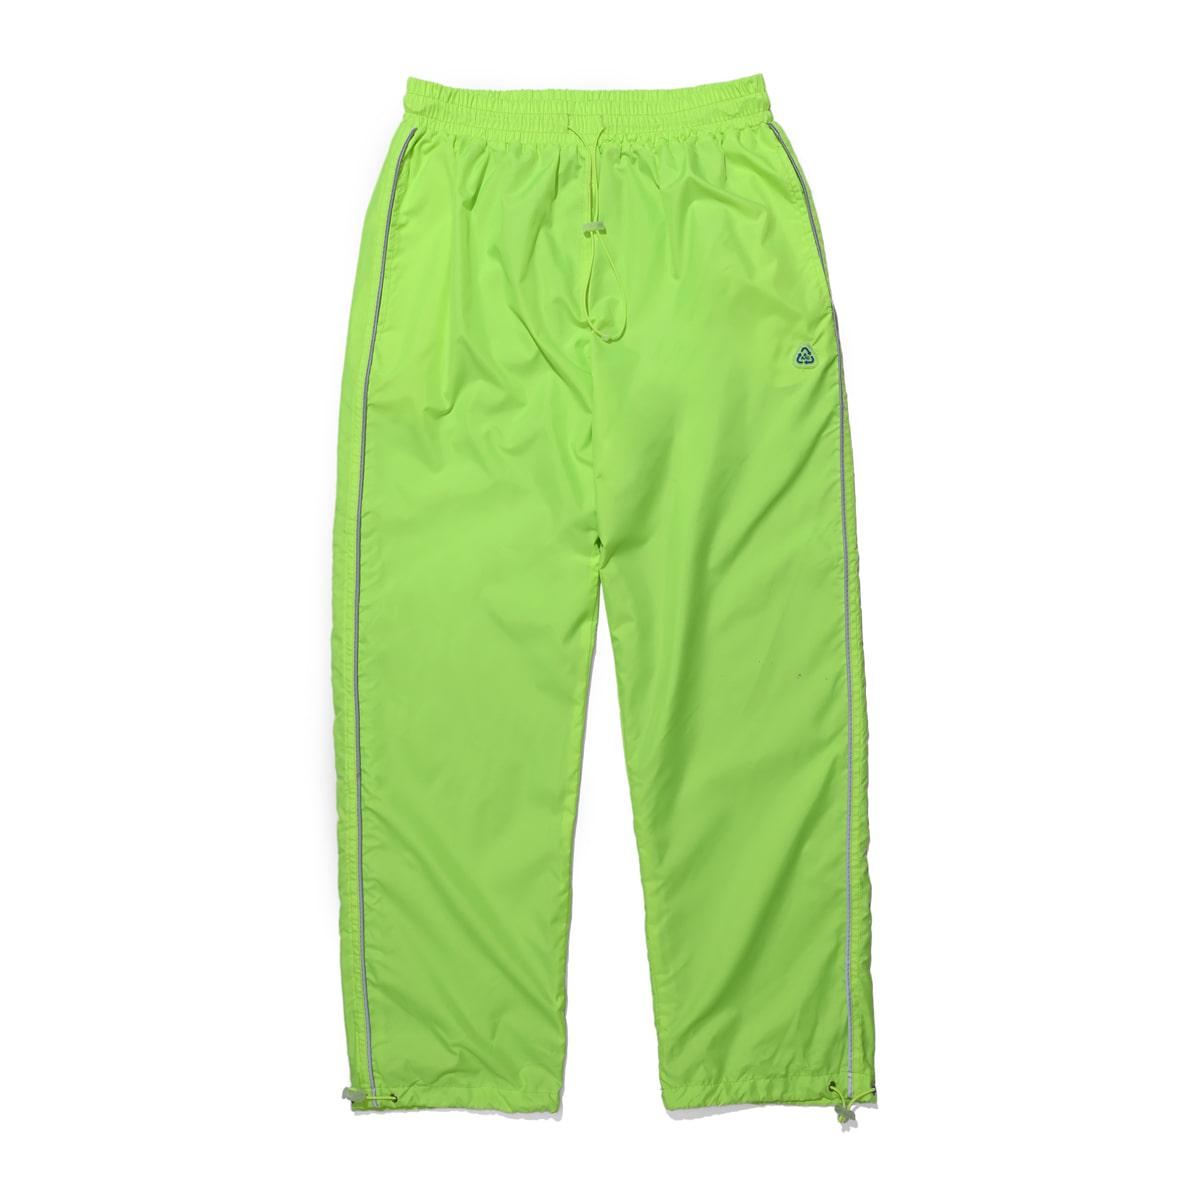 3M track pants (neon)